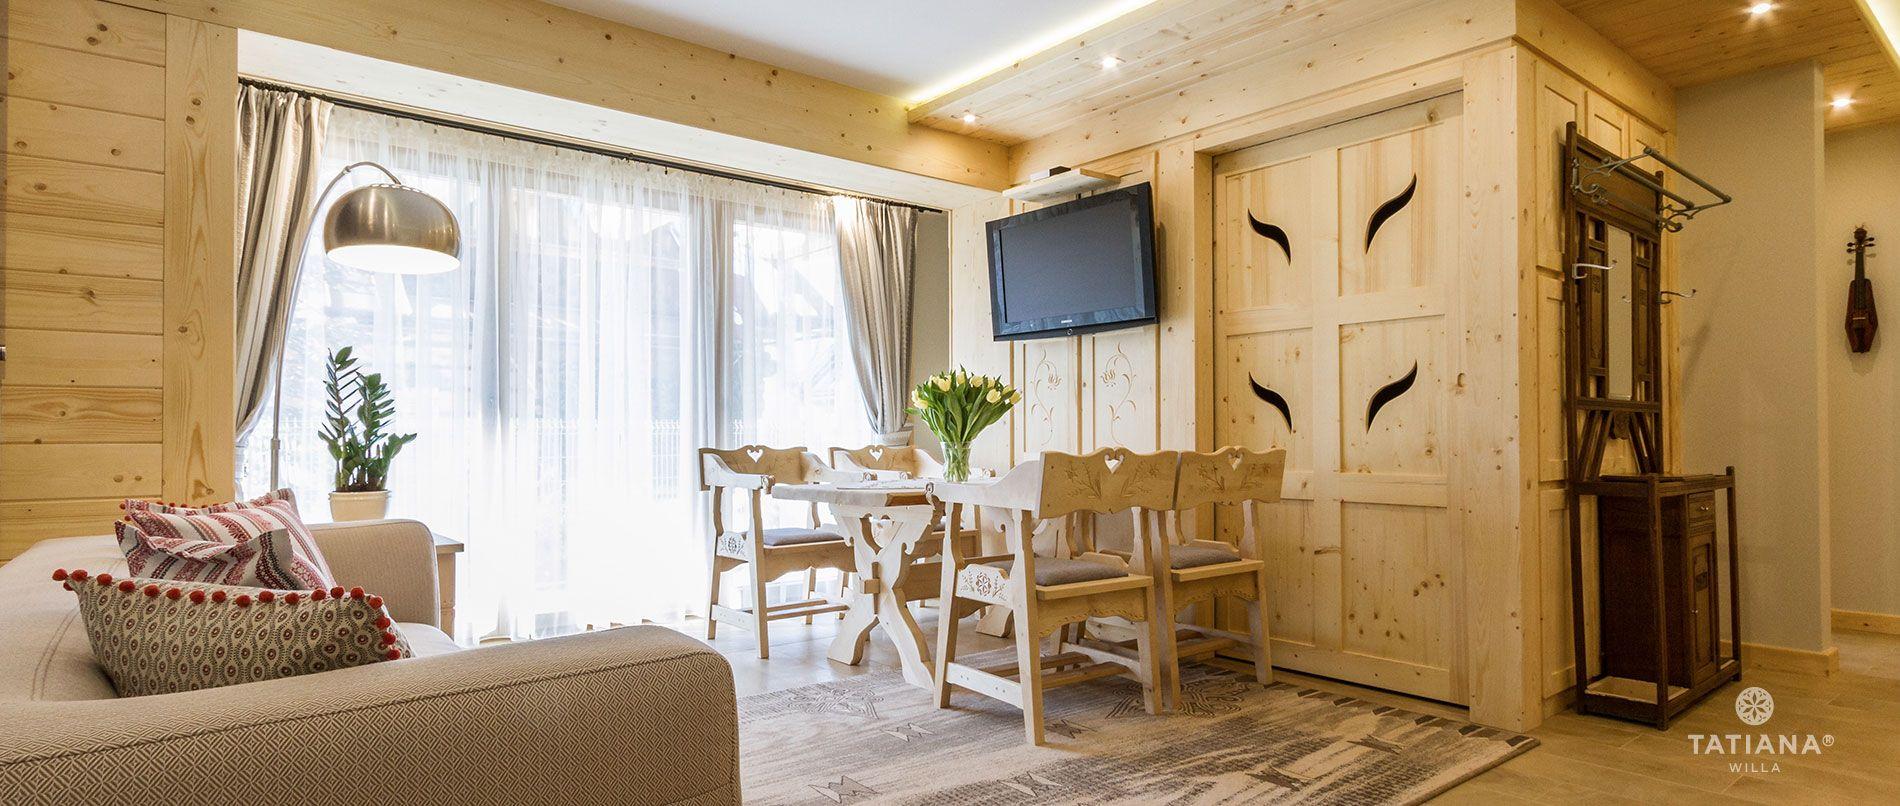 Apartament Sosnowy- salon